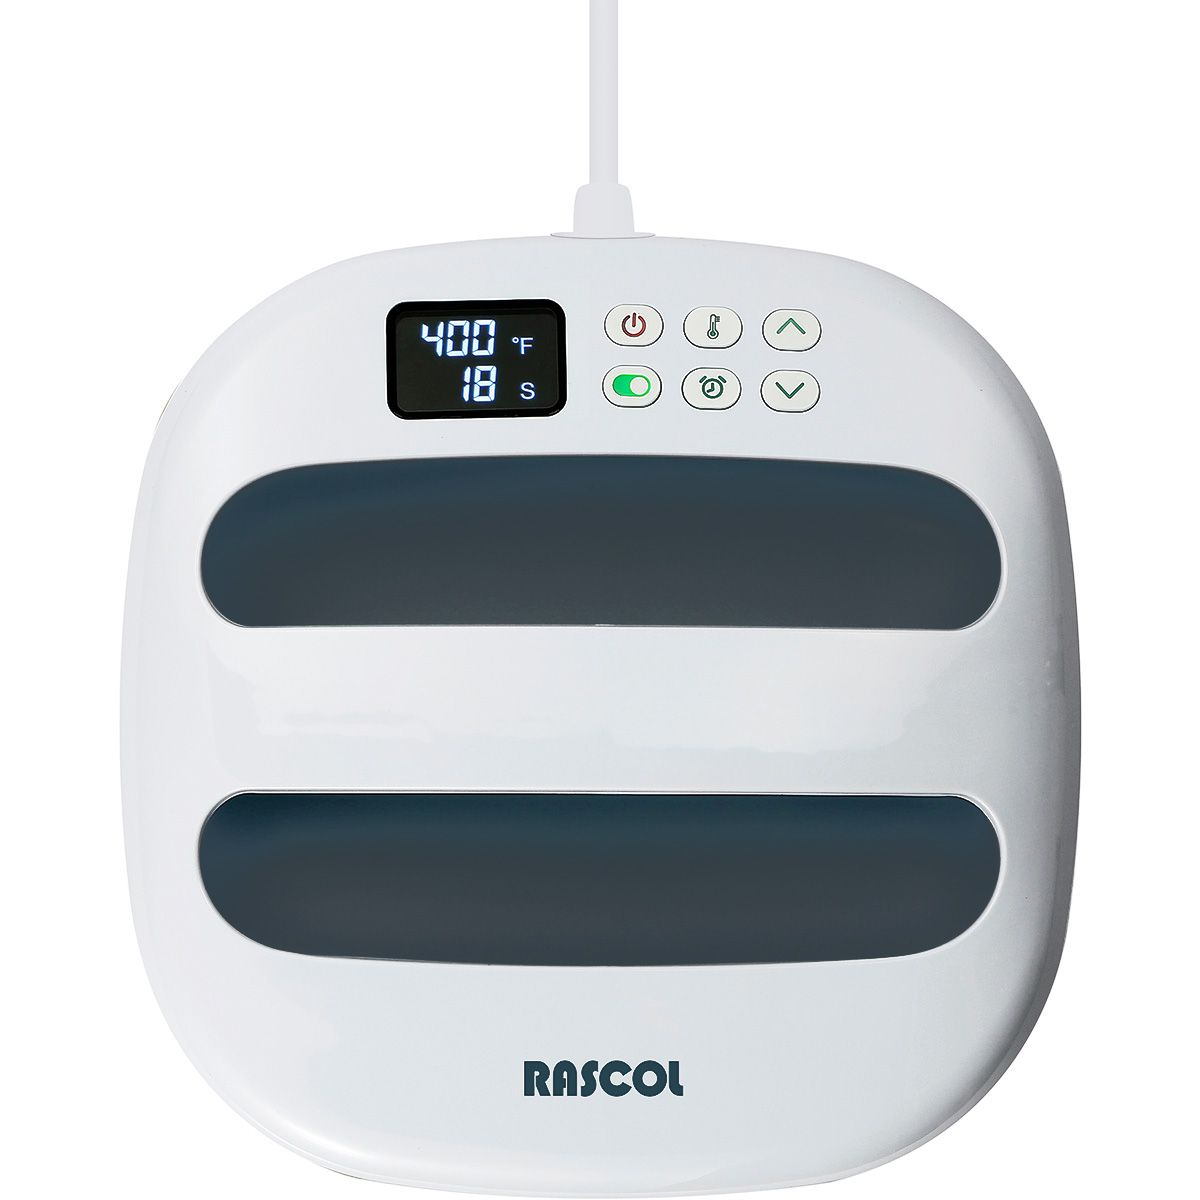 Presse à chaud portable Rascol - 22,5 cm x 22,5 cm